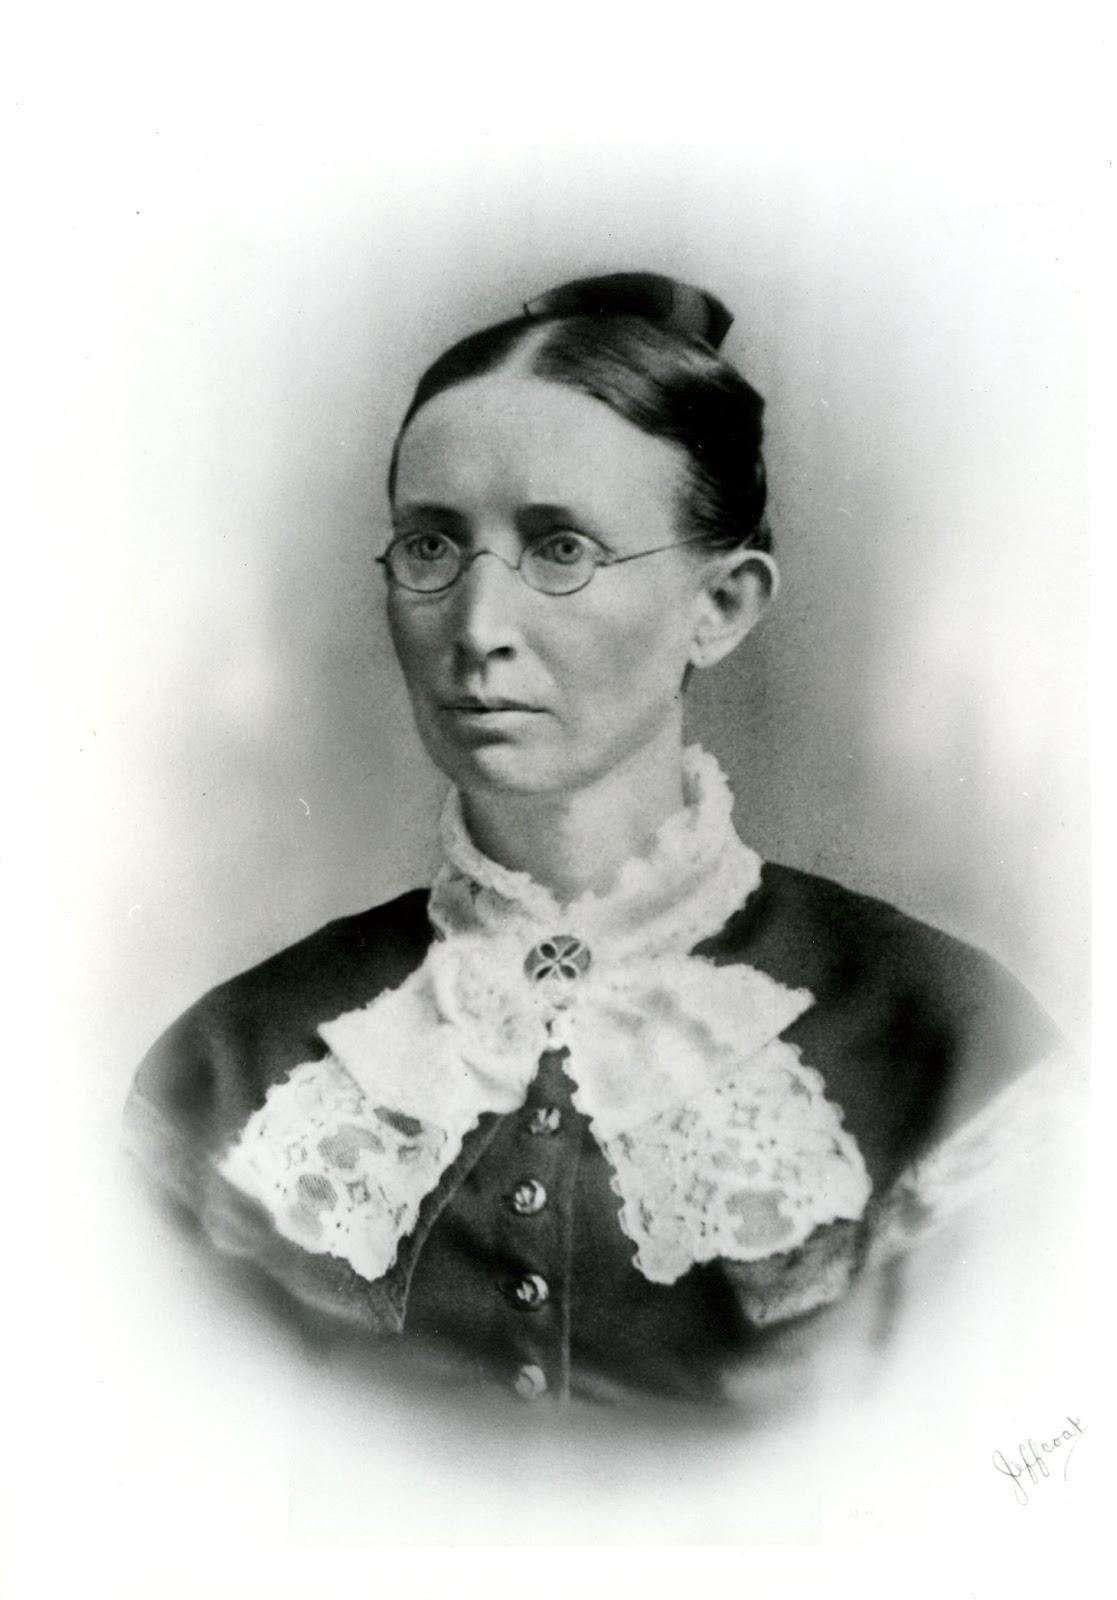 Kansas dickinson county abilene - Photograph Courtesy Of The Dickinson County Historical Society